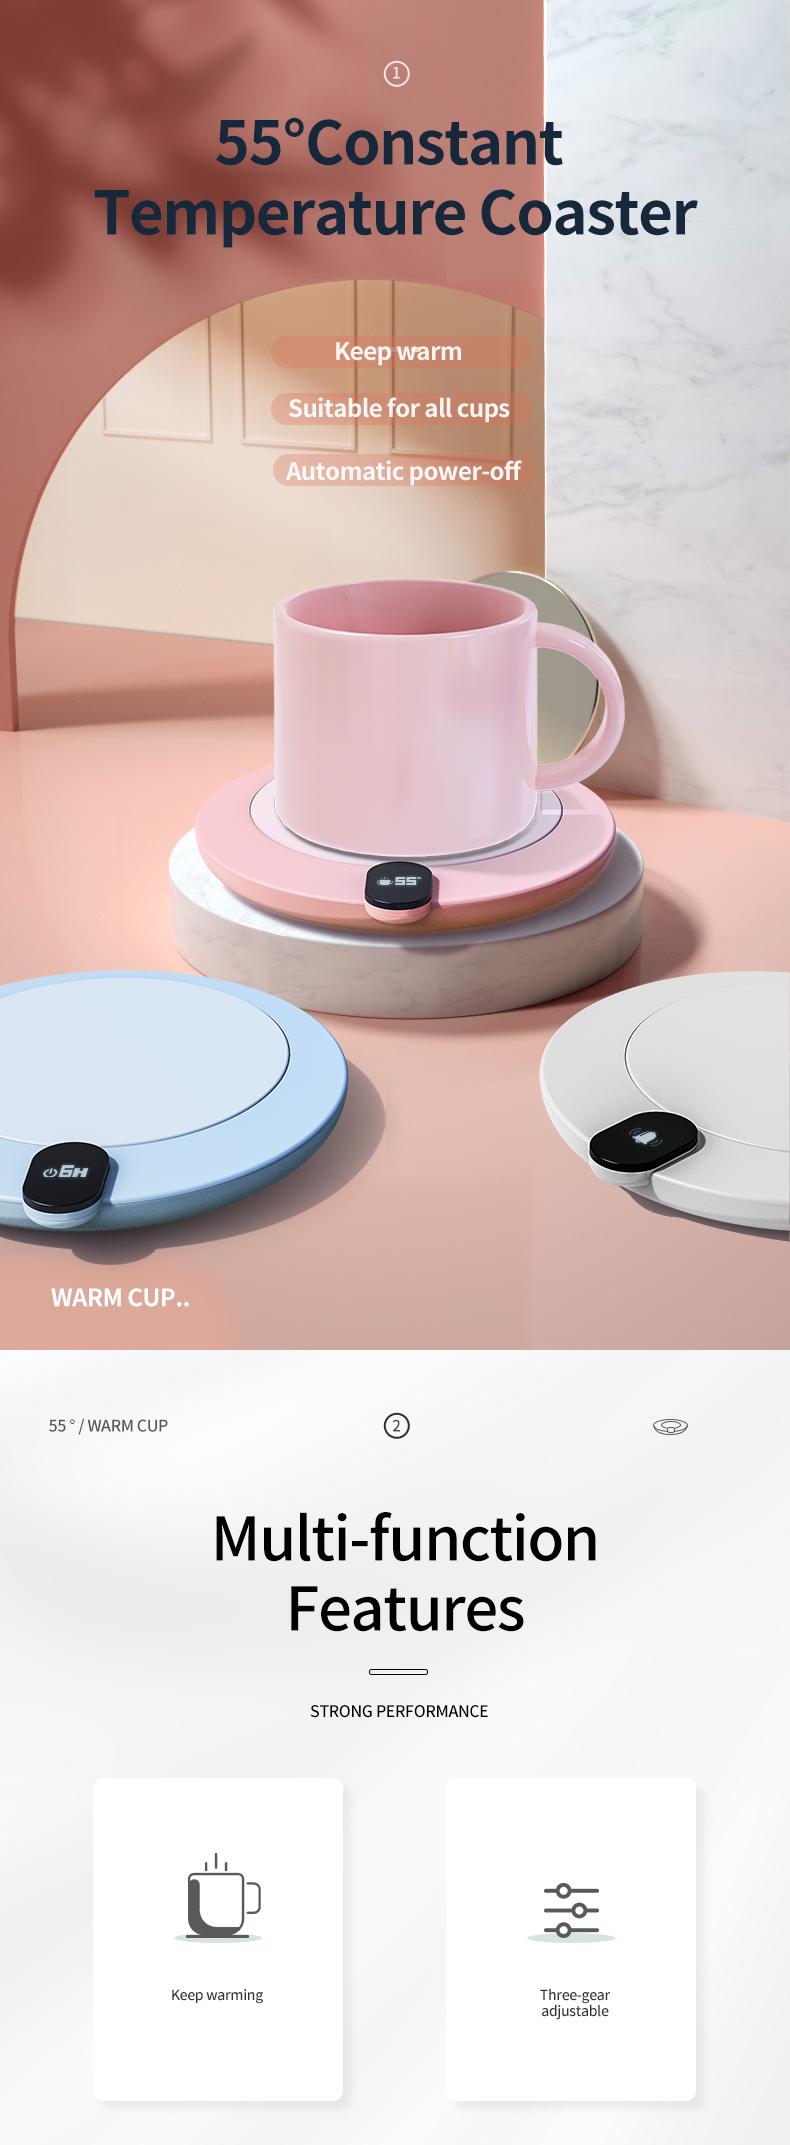 WYWD Customization Heating Coaster Smart USB Heating Mat warm Cup Automatic Power Off